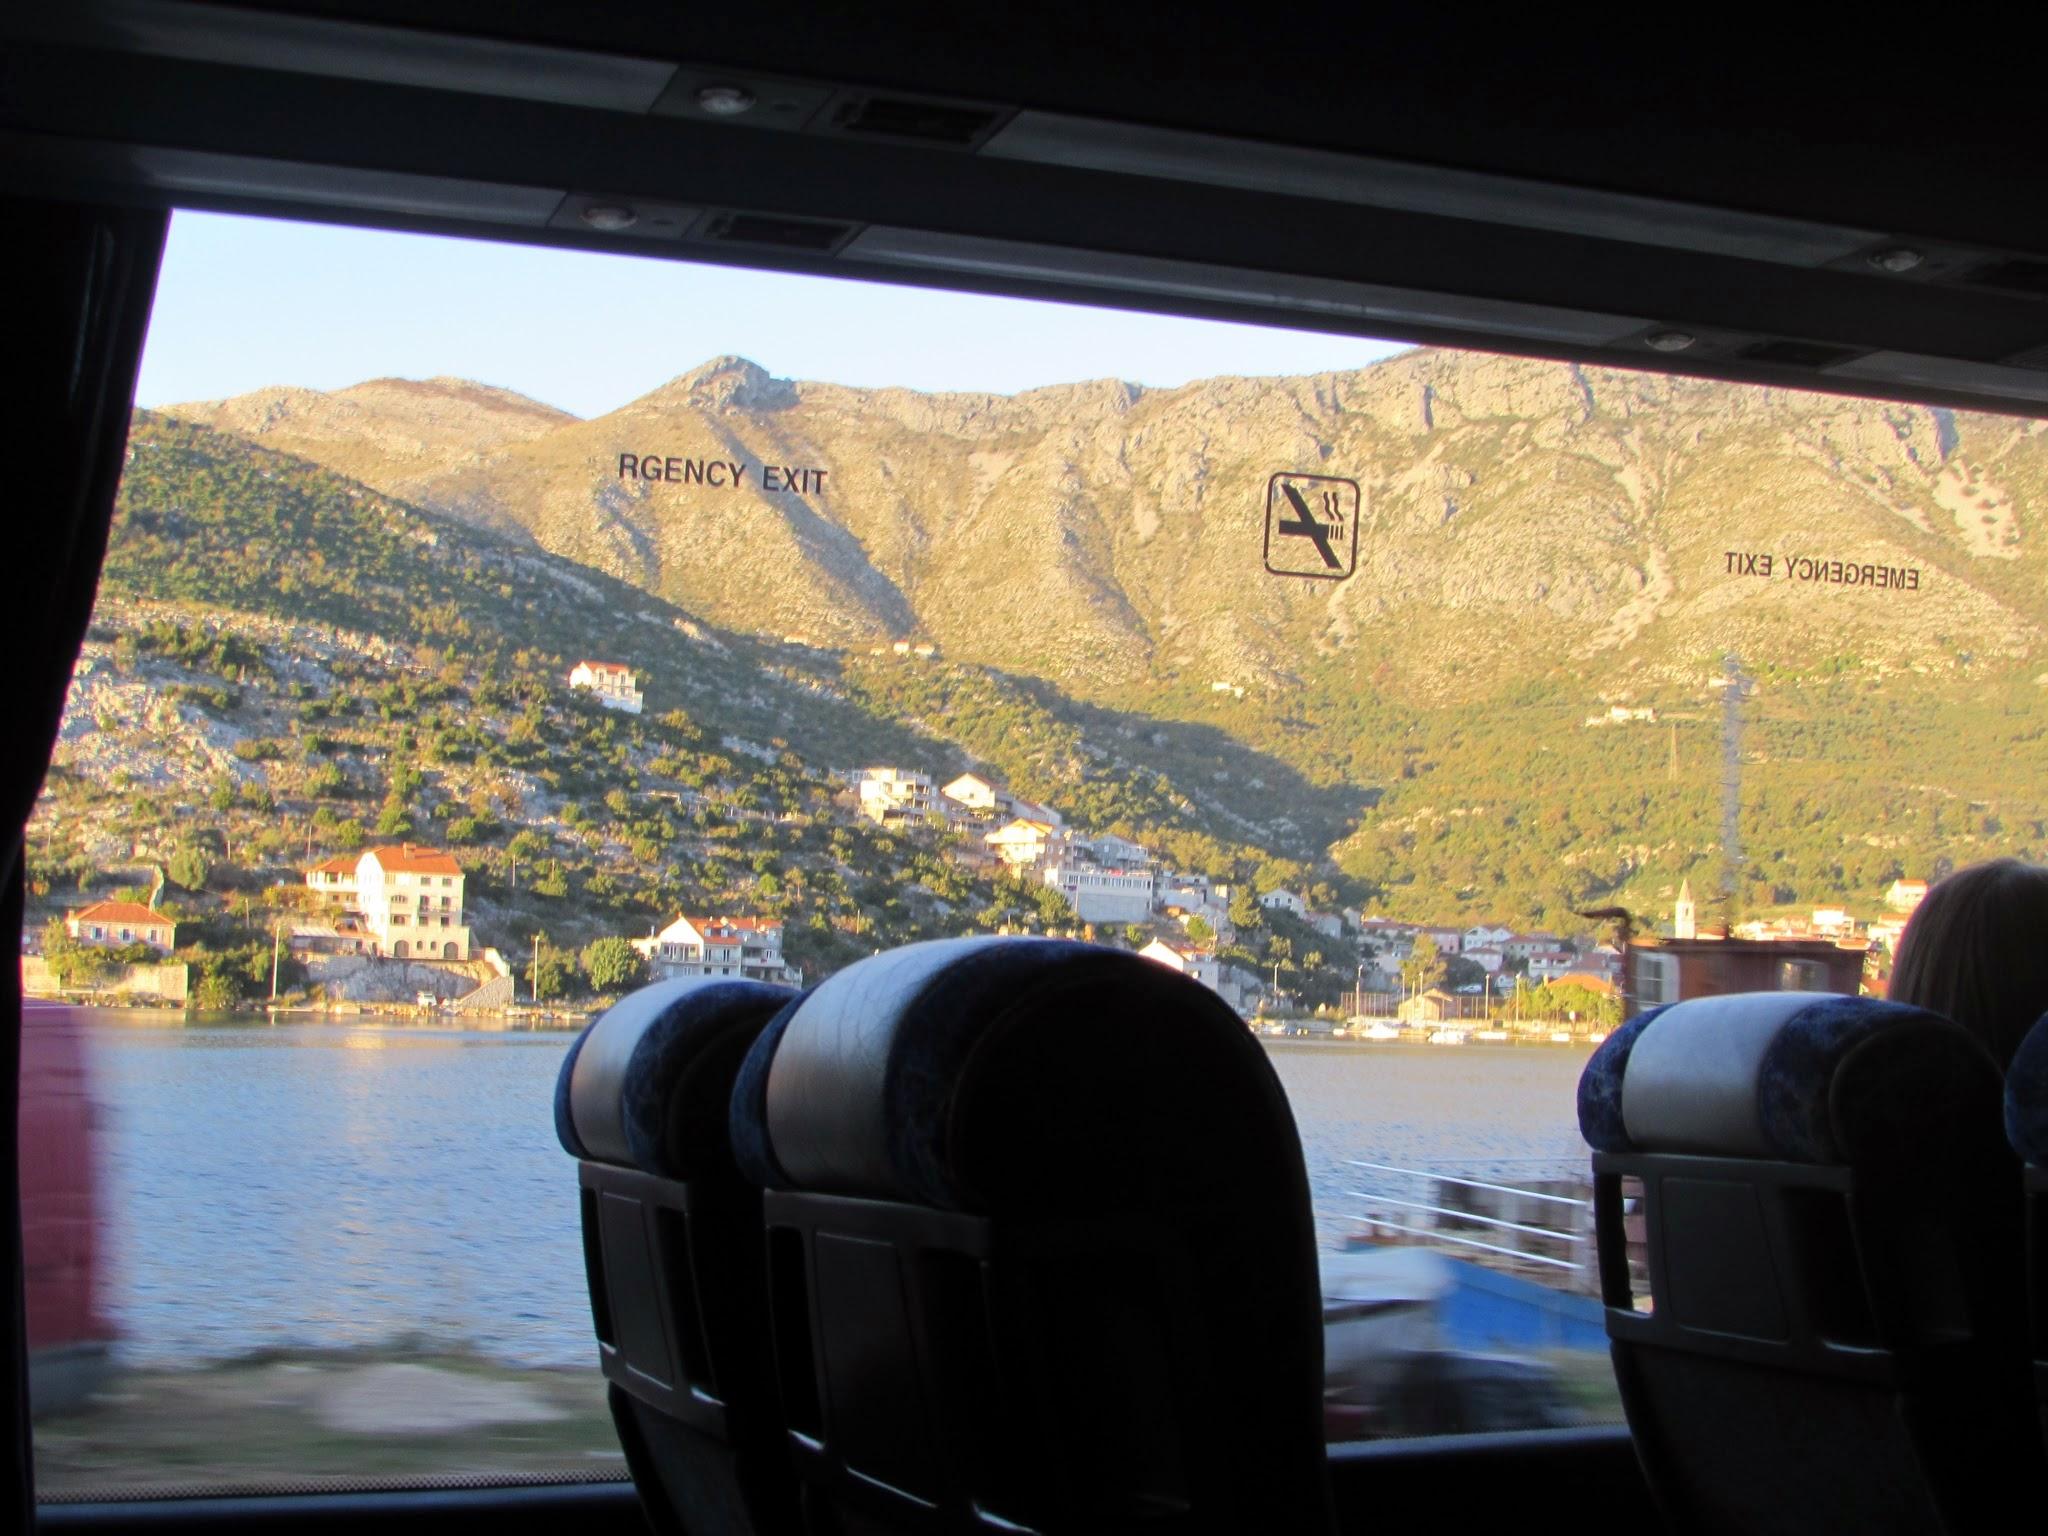 A bus ride down the Dalmatian Coast of Croatia.